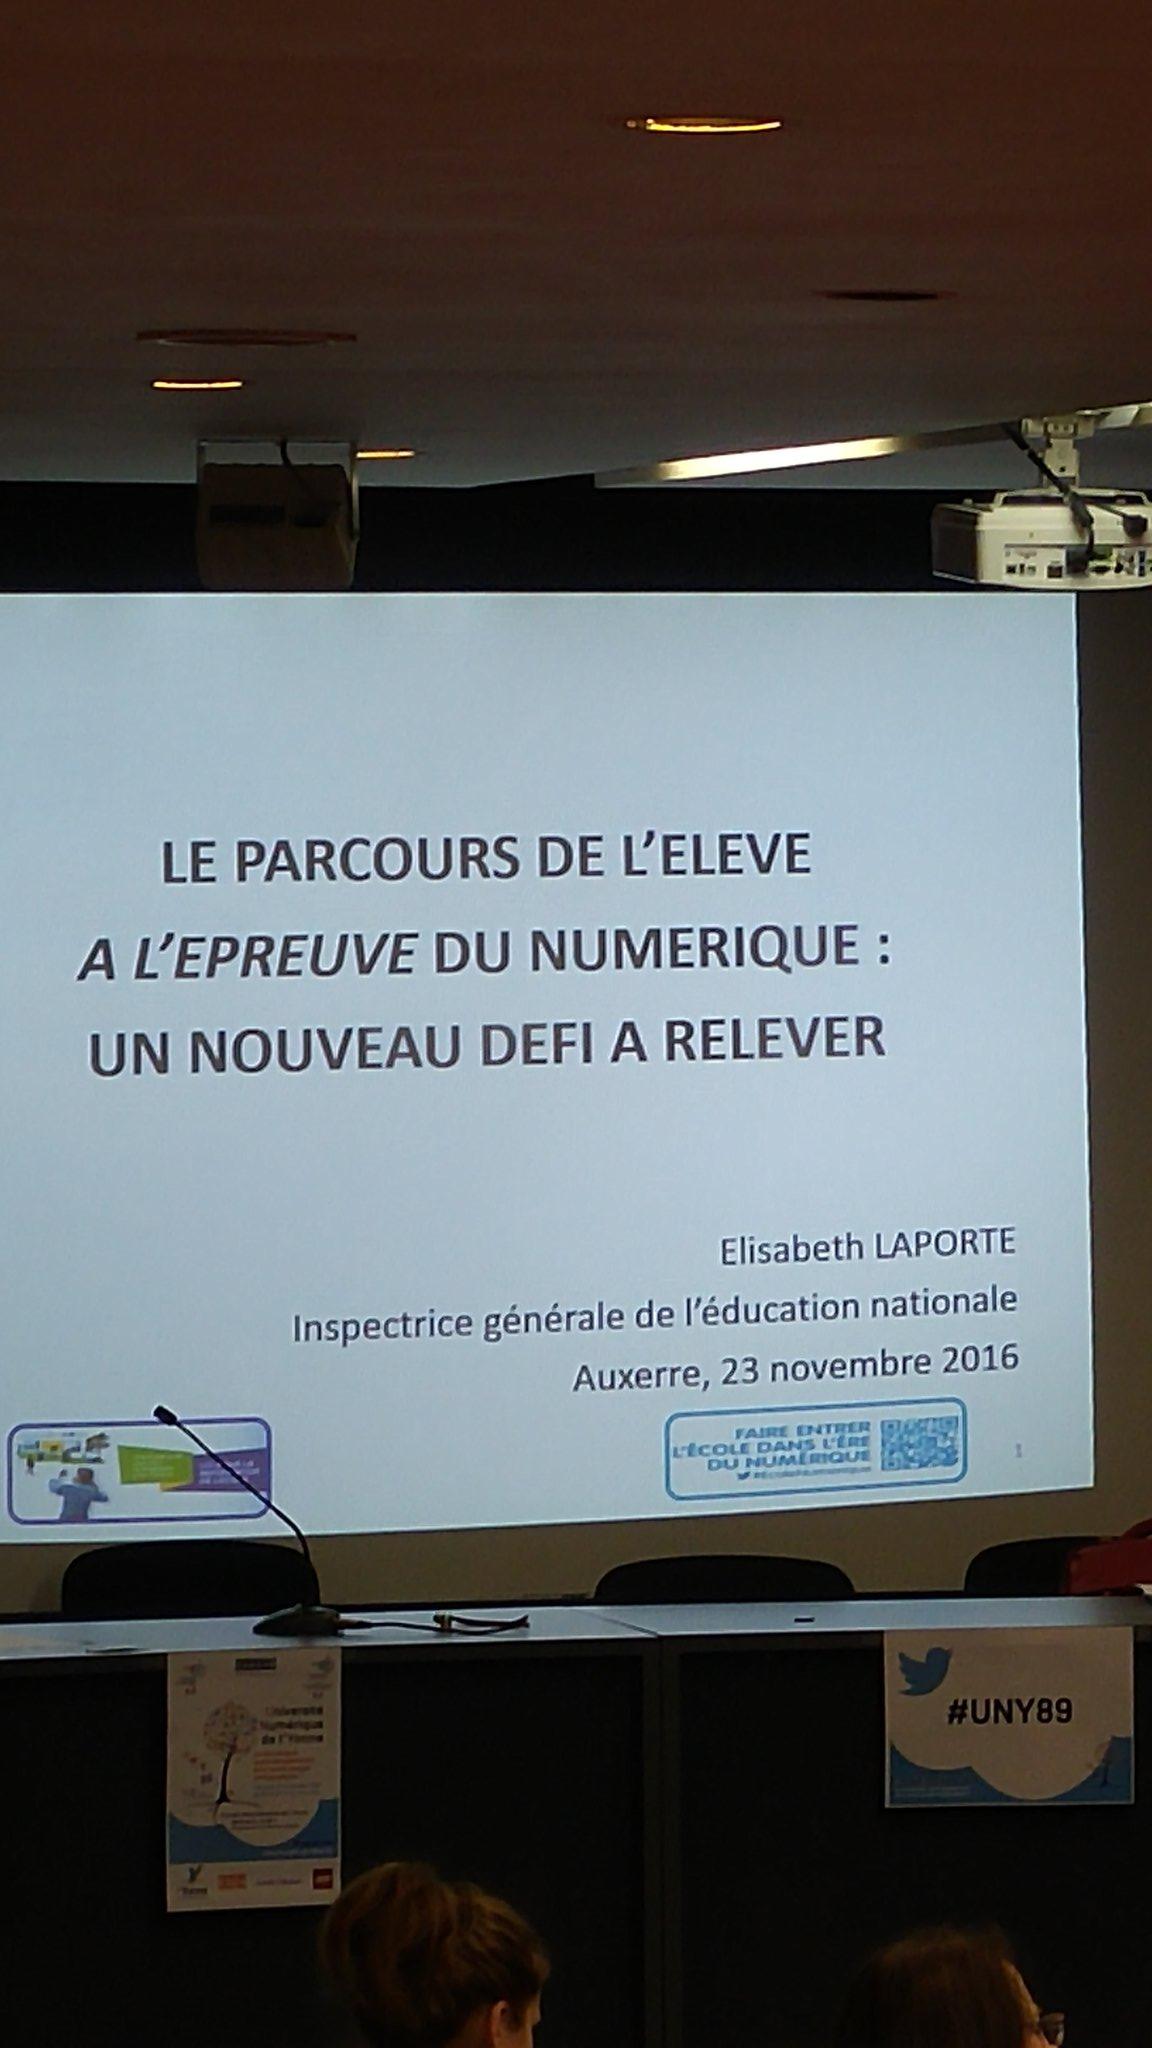 #UNY89 la conférence d'Elisabeth Laporte va débuter @canope_89 @reseau_canope https://t.co/gWYrhuQSbW